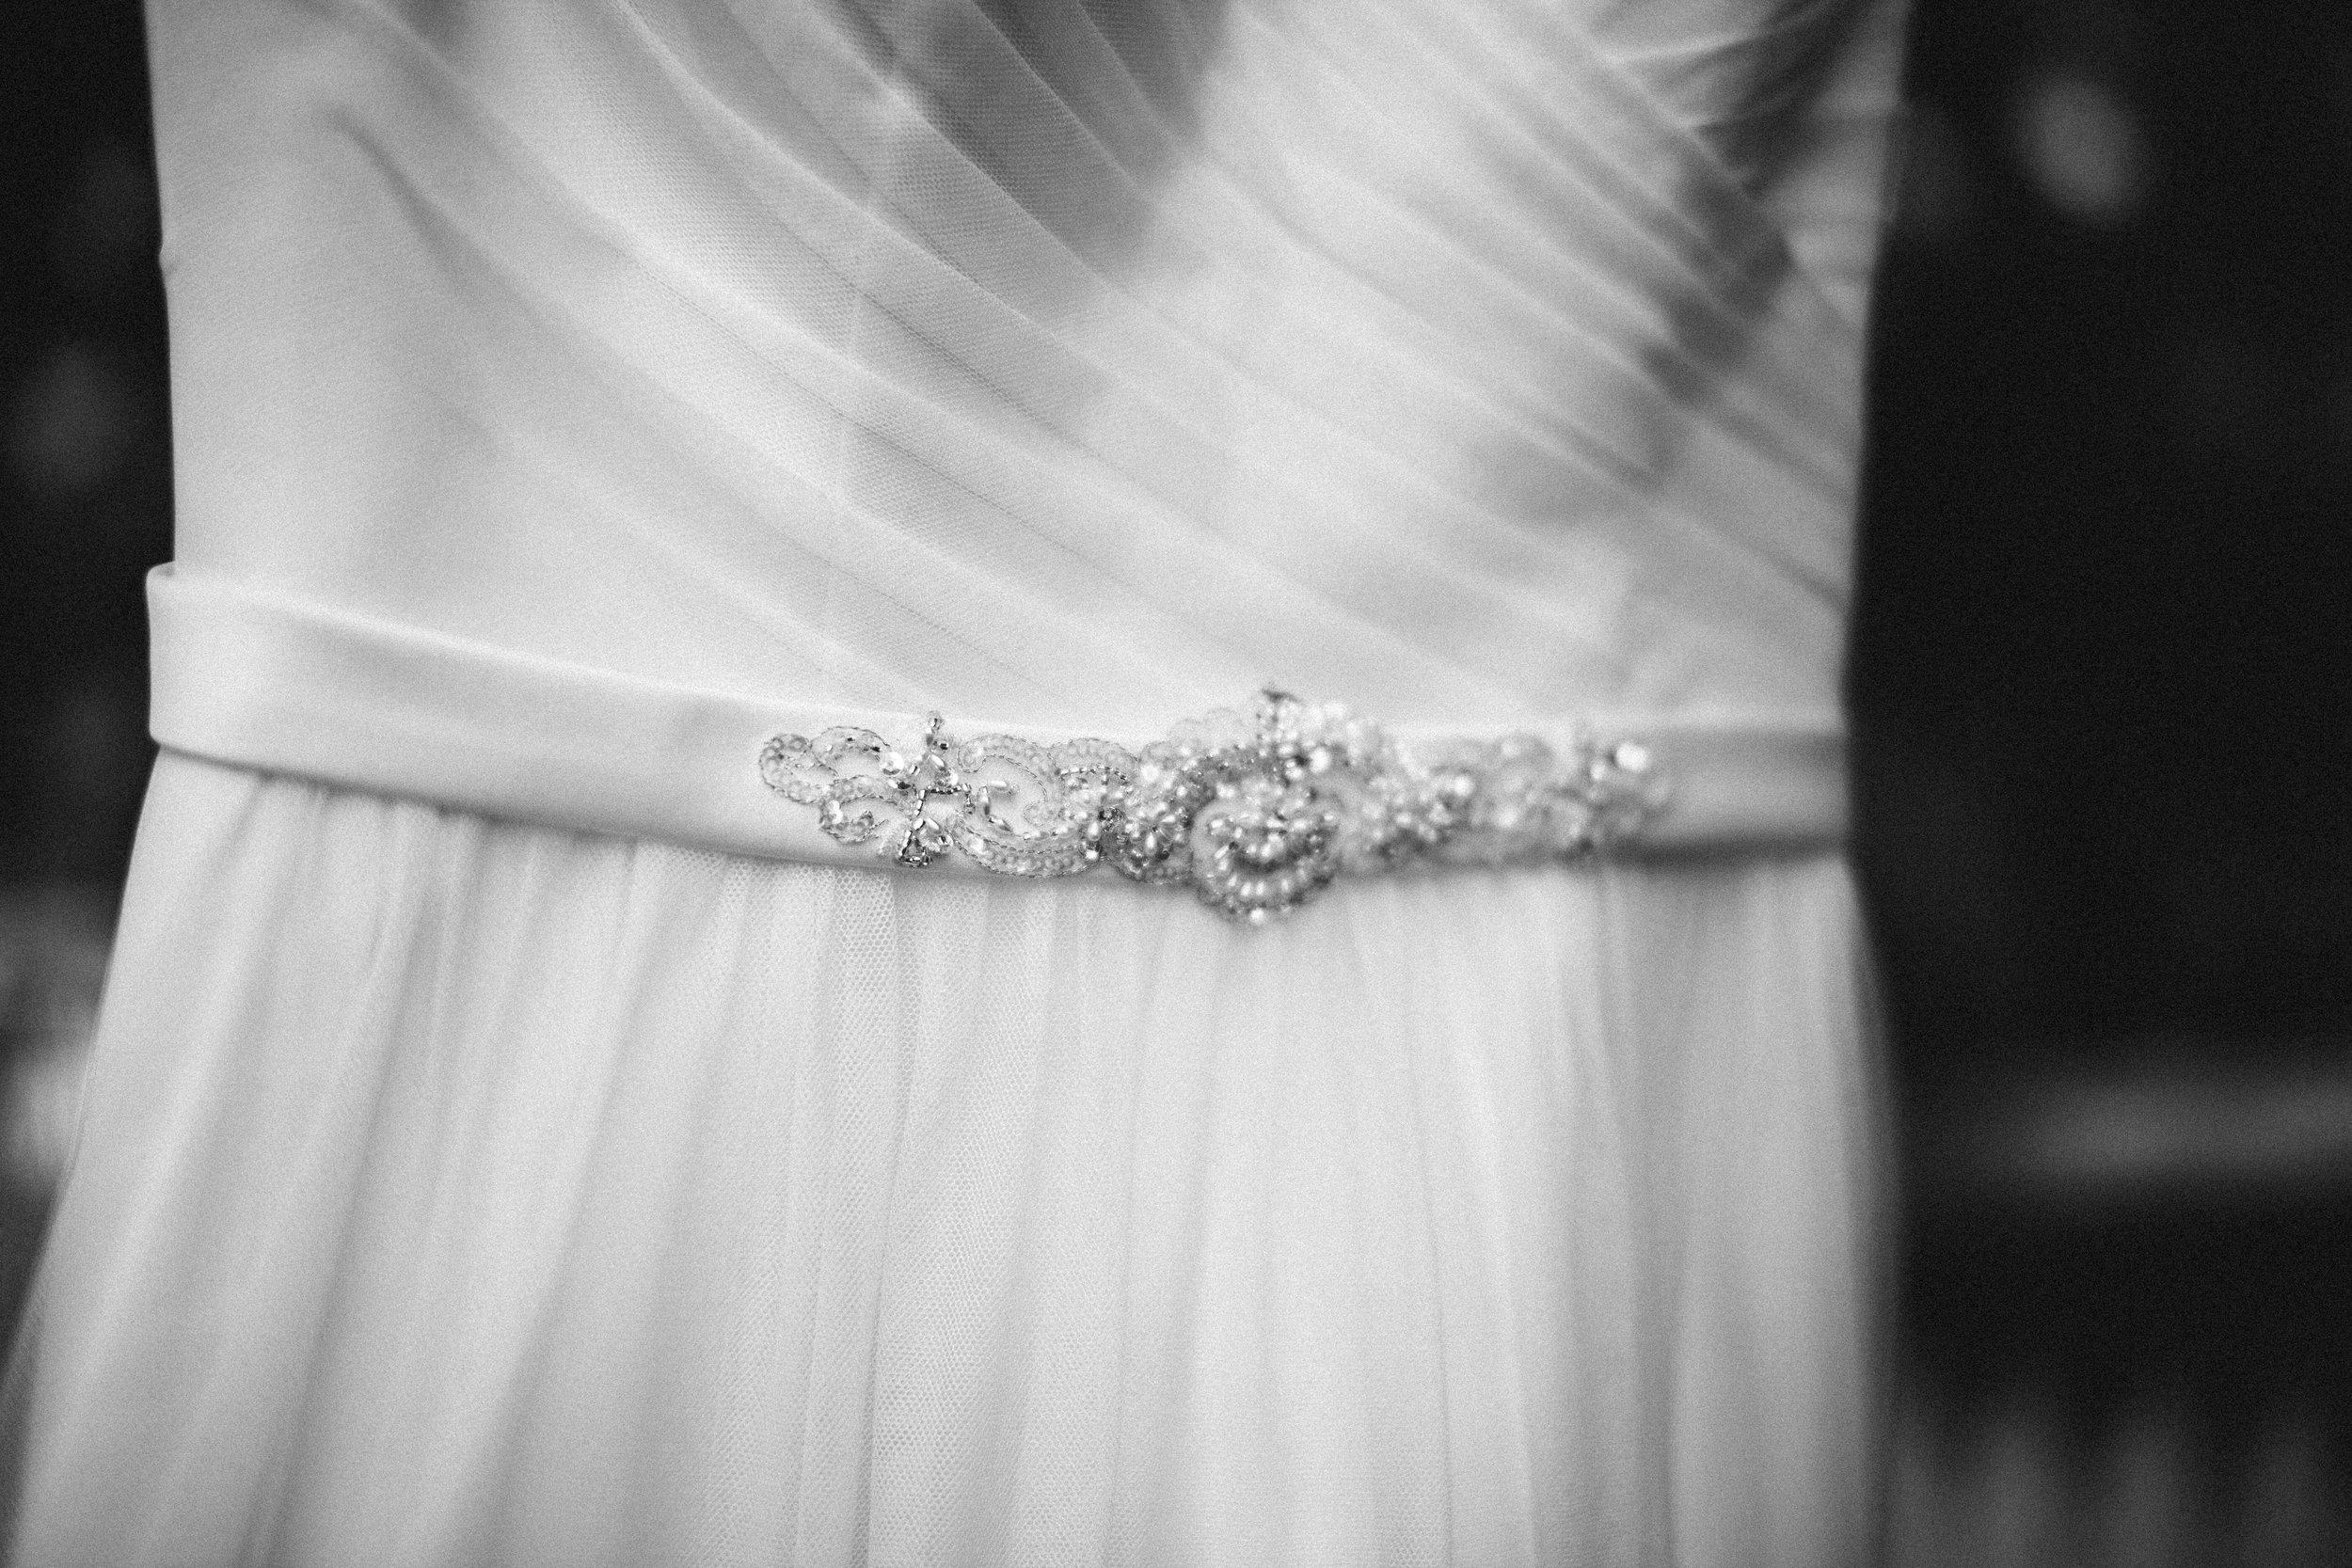 wedding-dress-with-belt.jpg